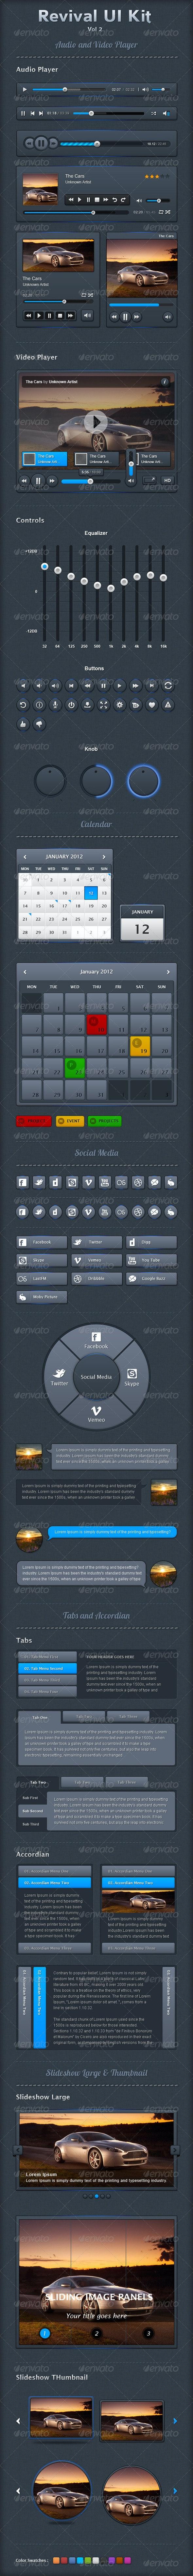 Revival UI Kit Vol 2 - User Interfaces Web Elements